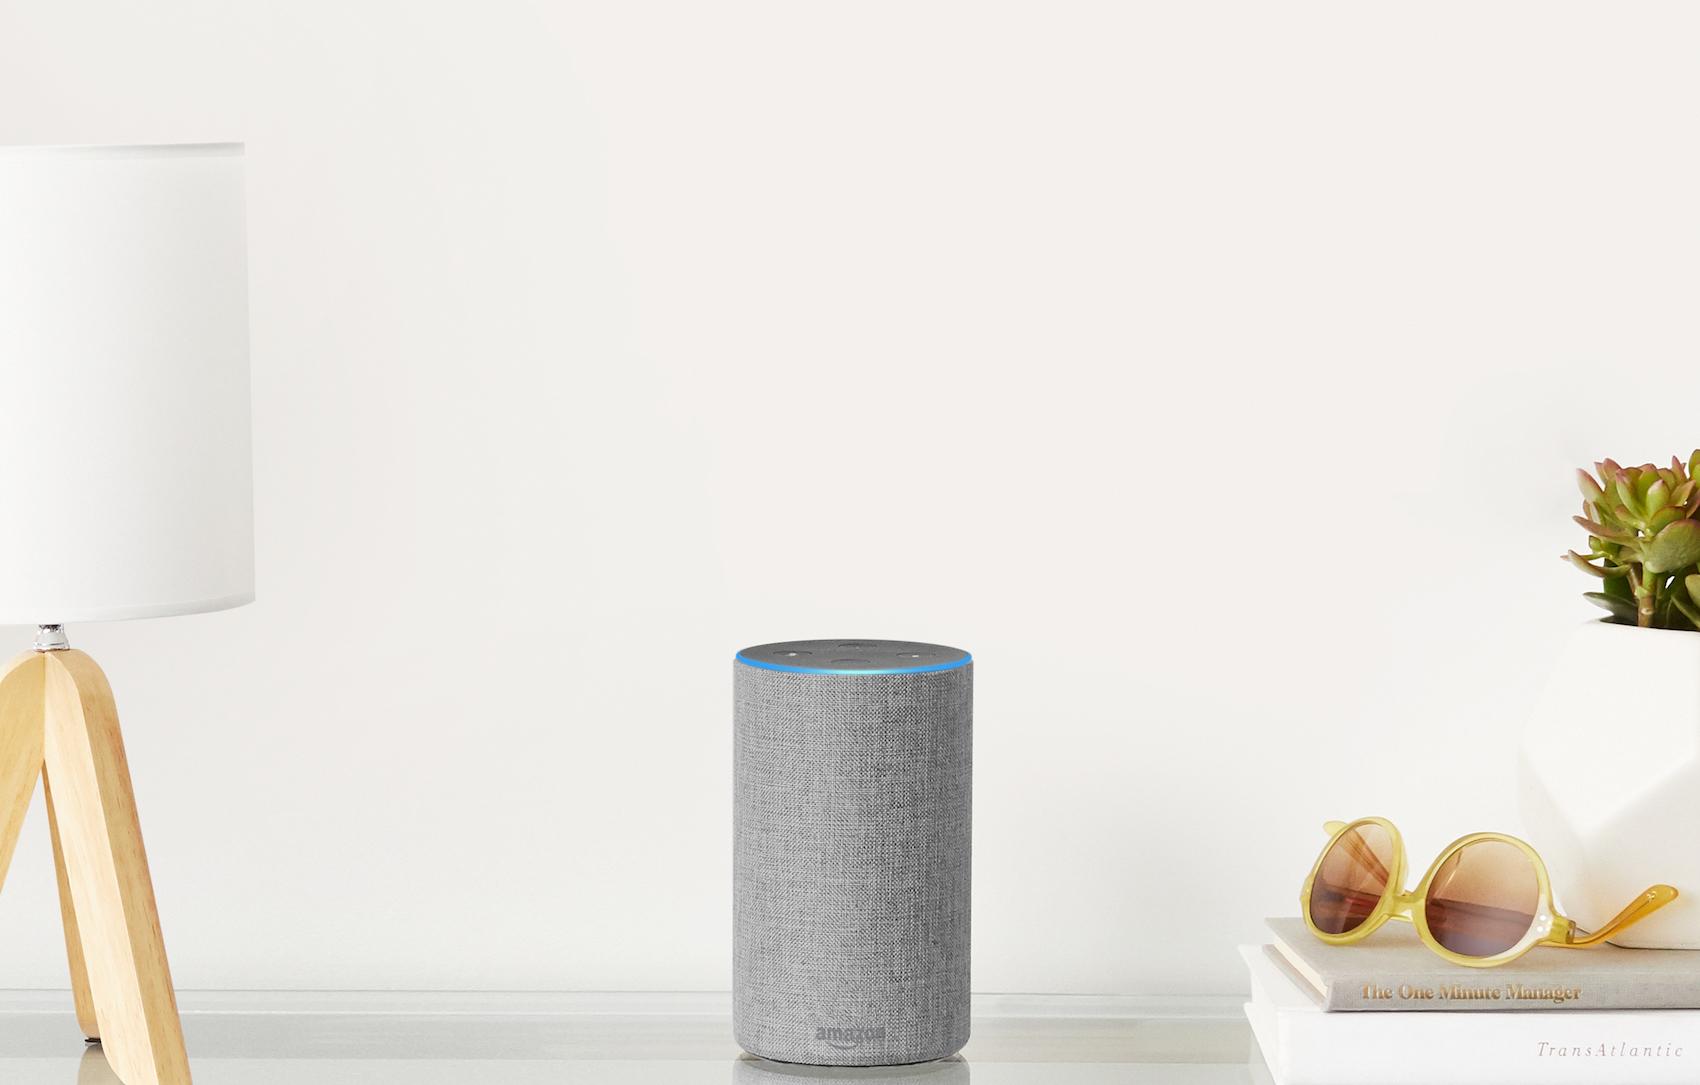 Amazon Echo smart speaker on table.